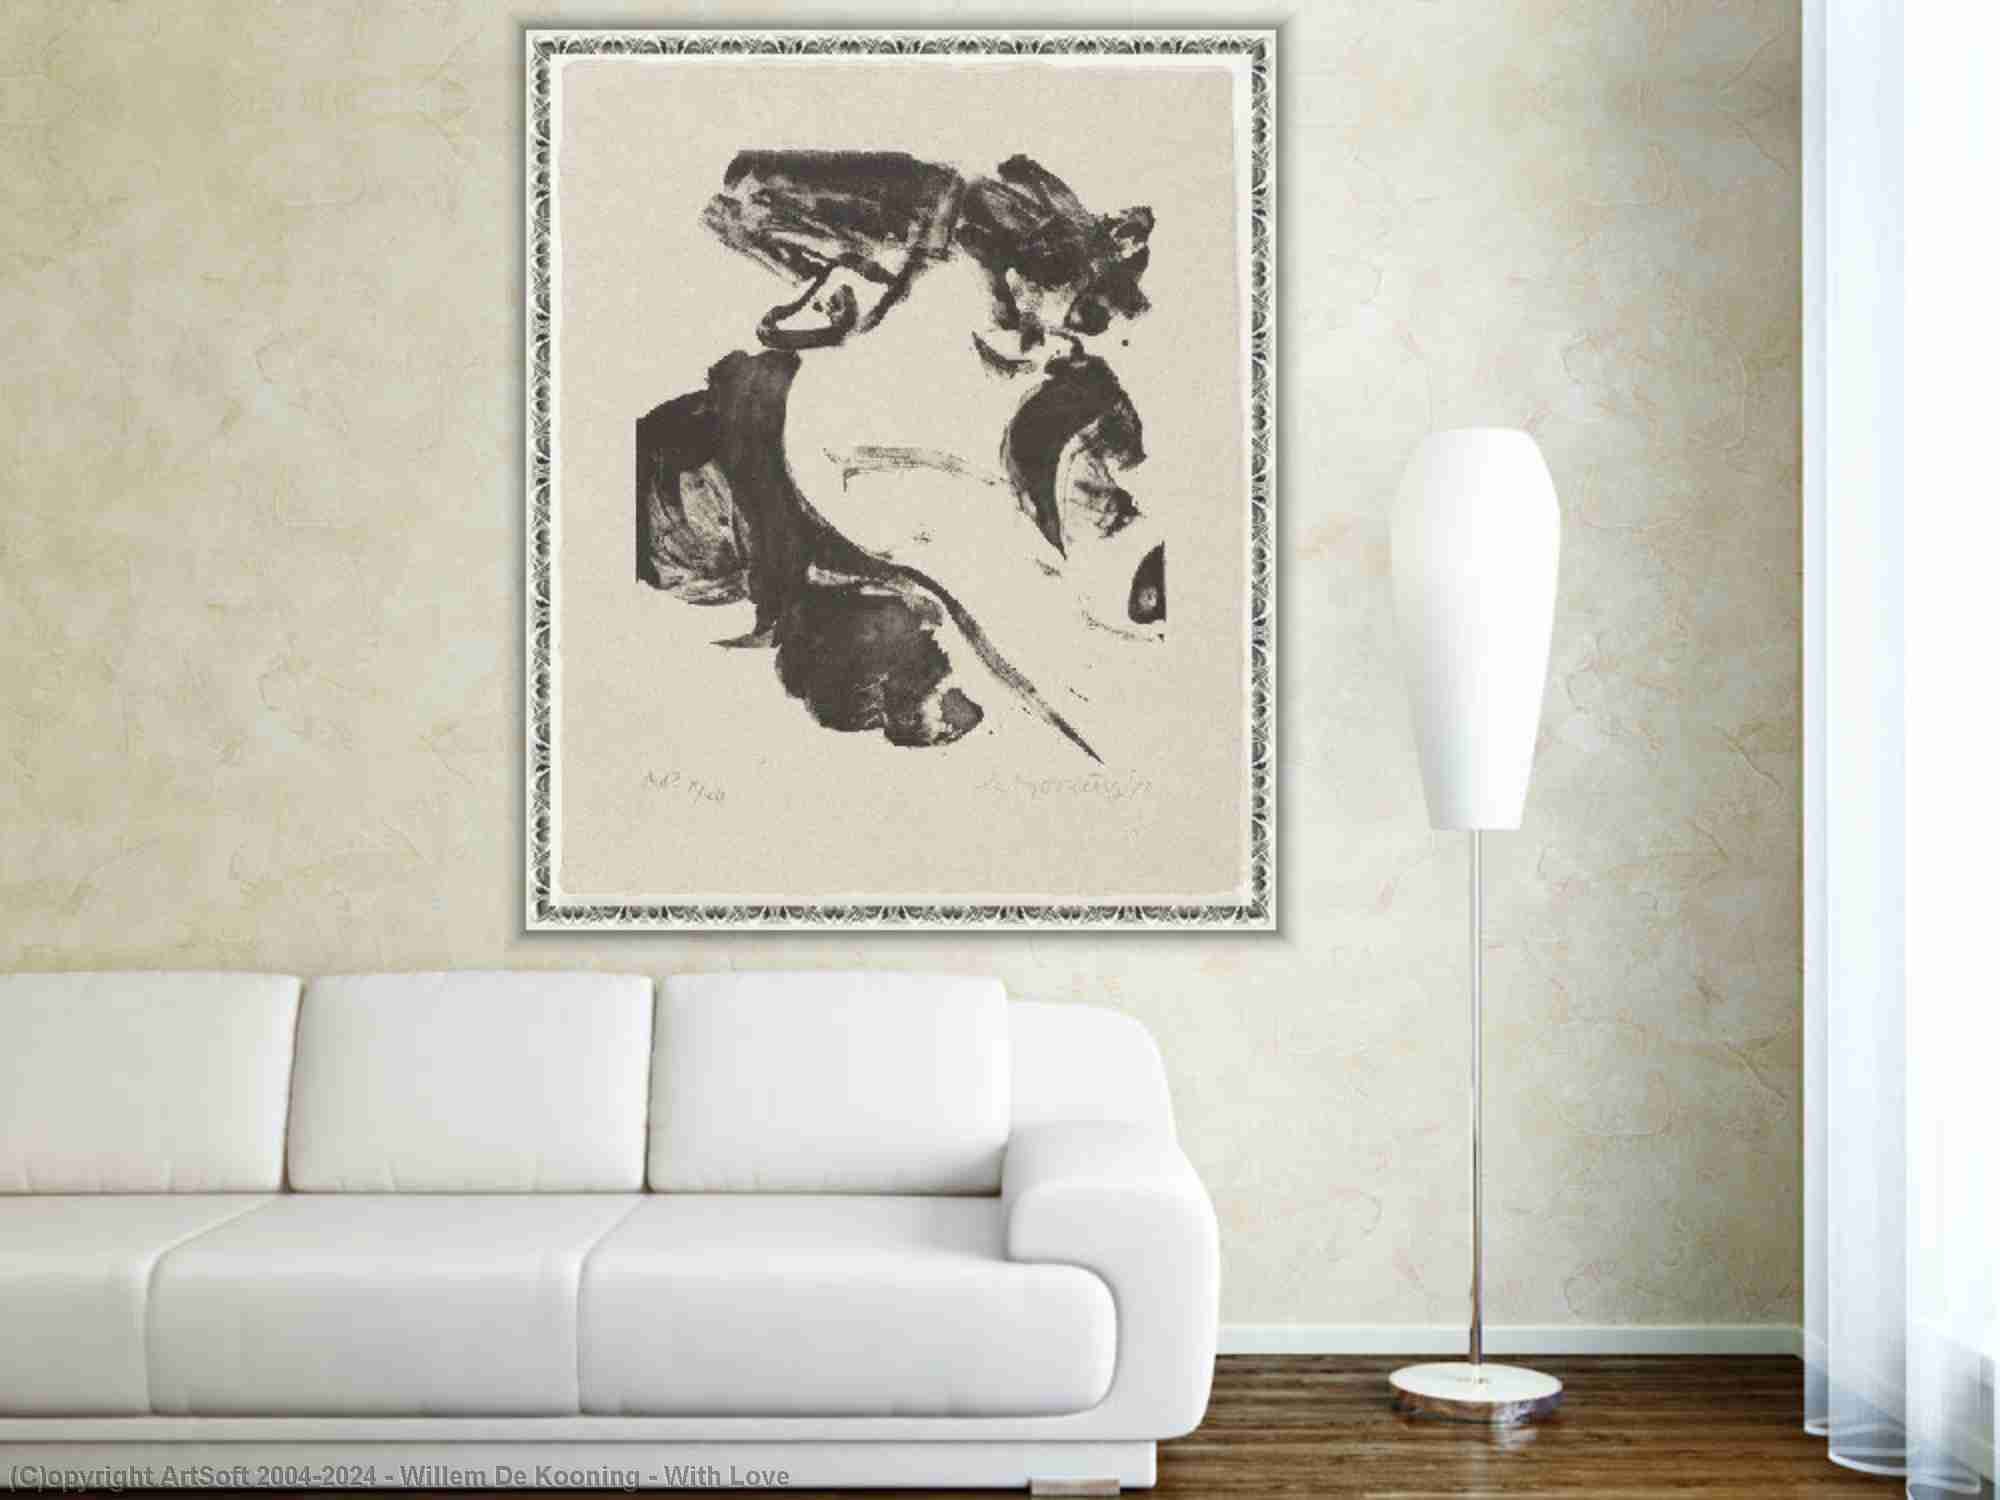 Willem De Kooning - С любовью